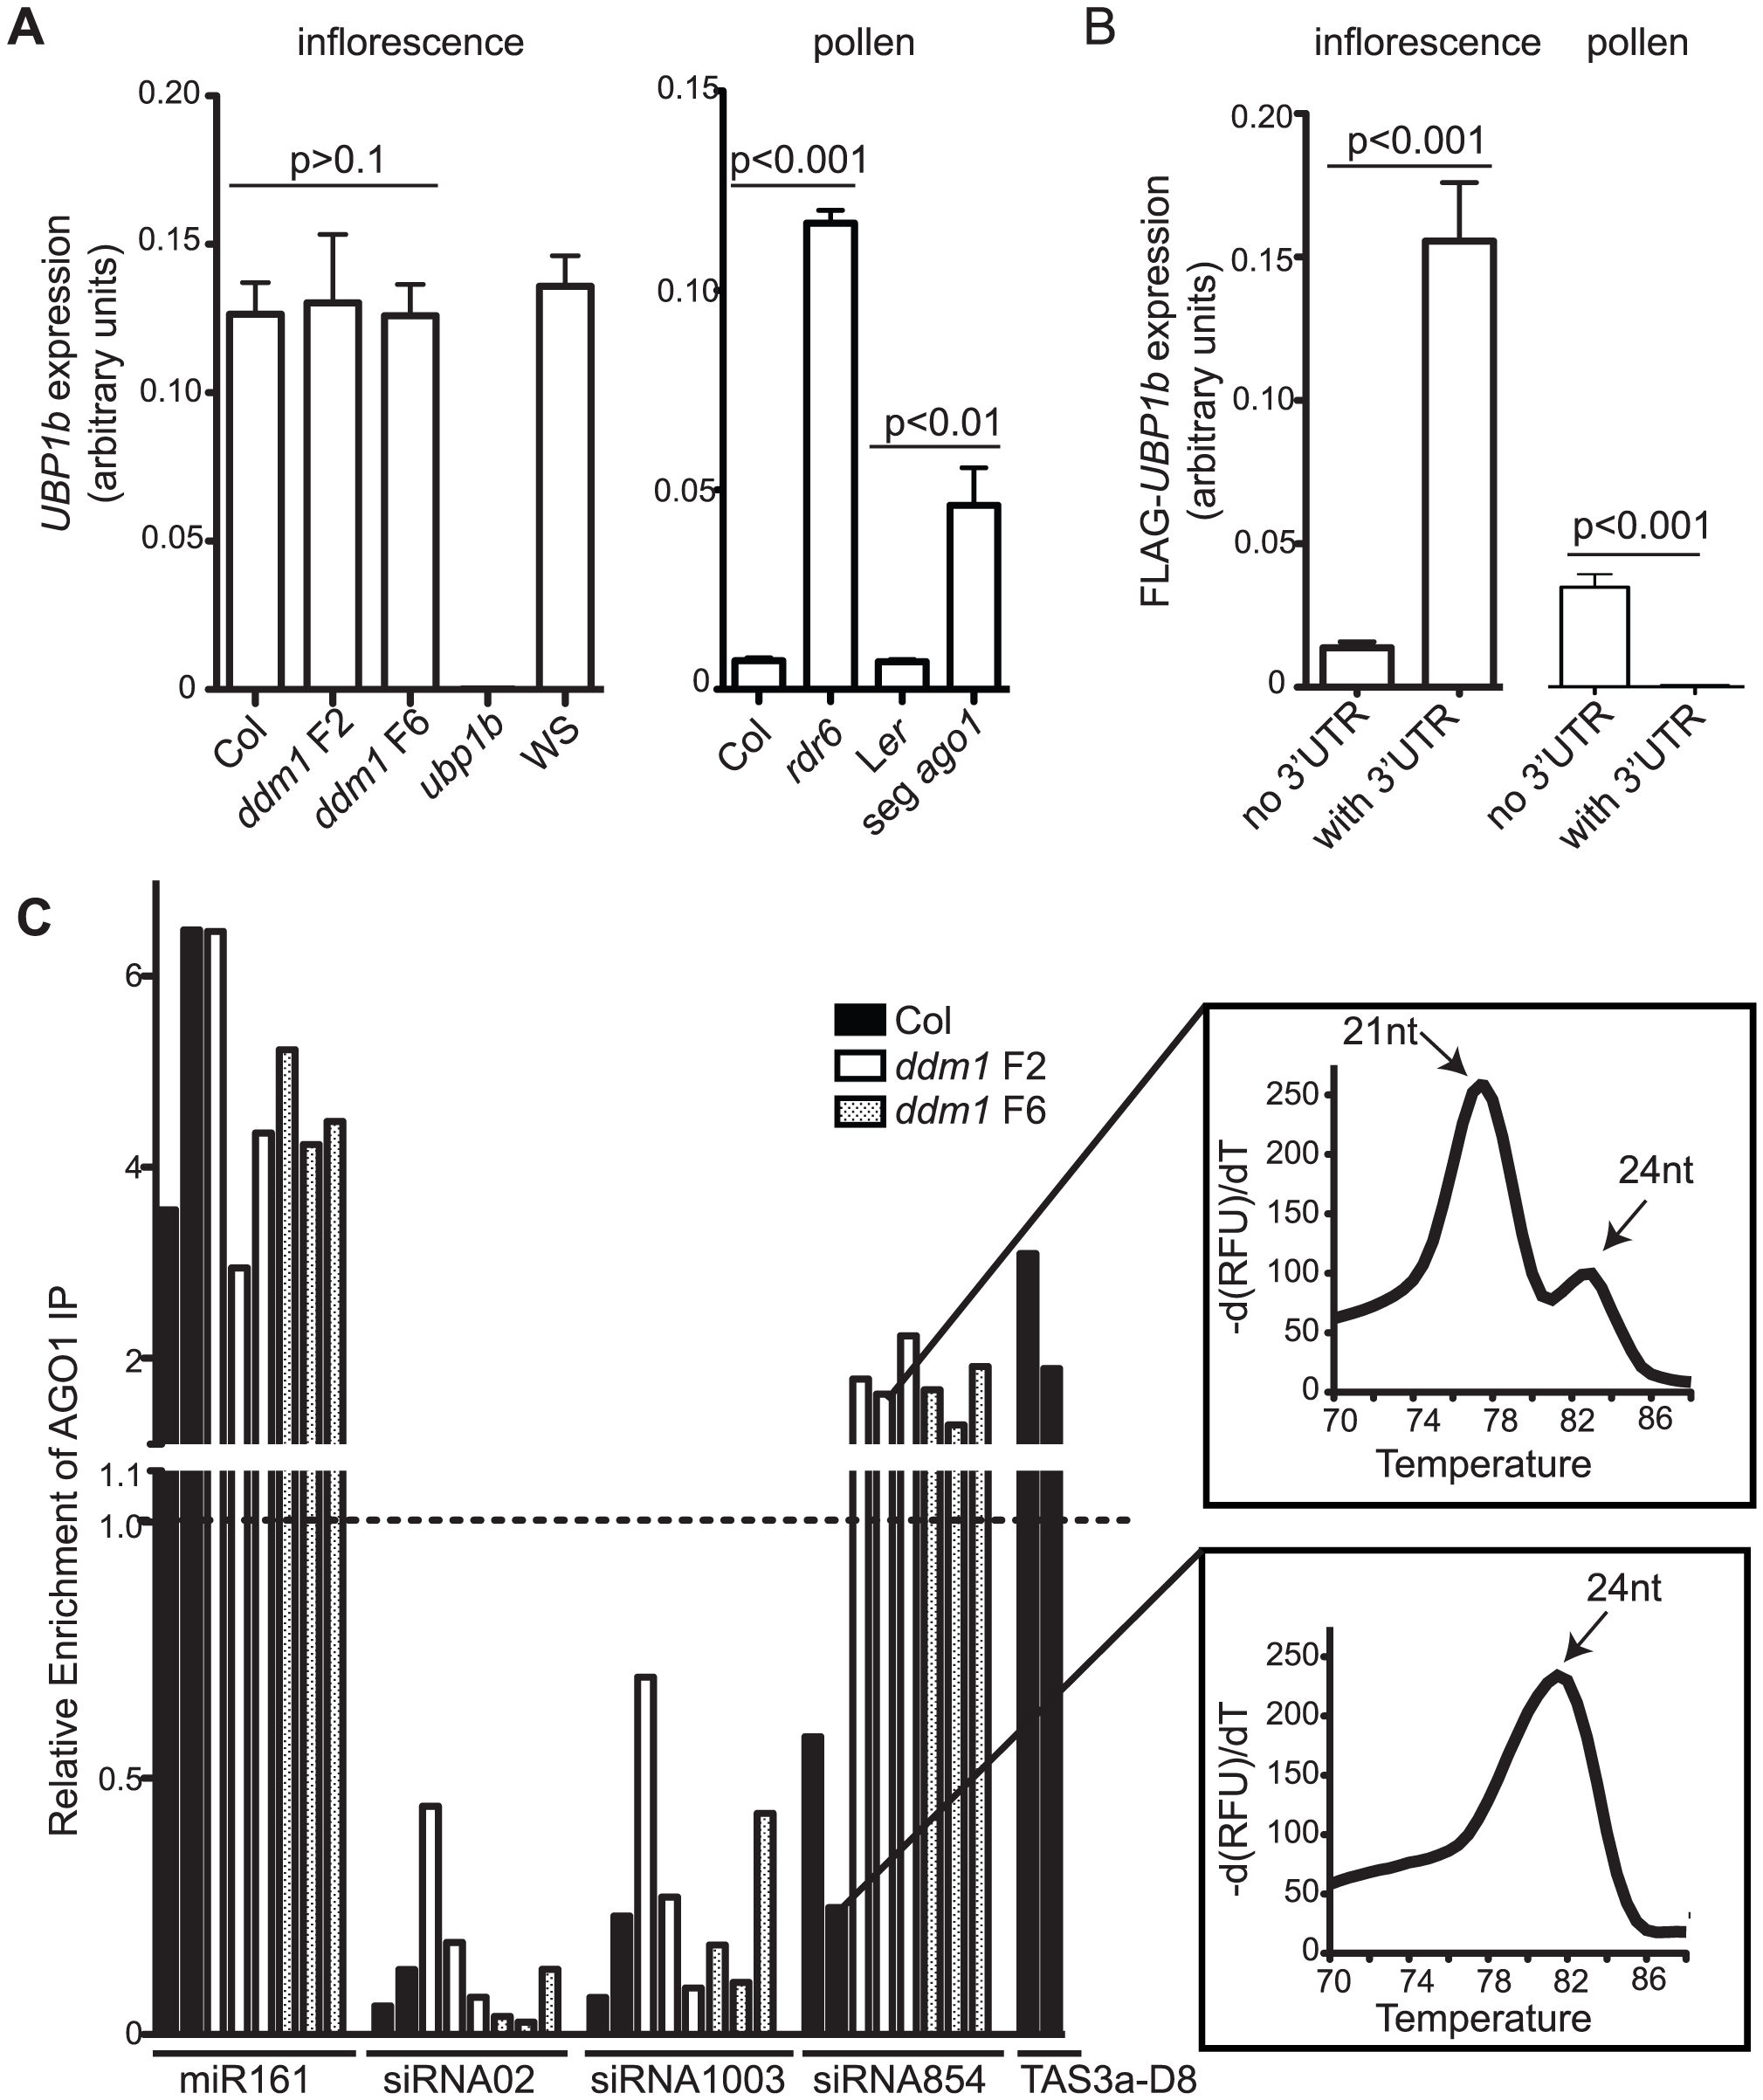 Tissue-specific regulation of <i>UBP1b</i> by siRNA854.